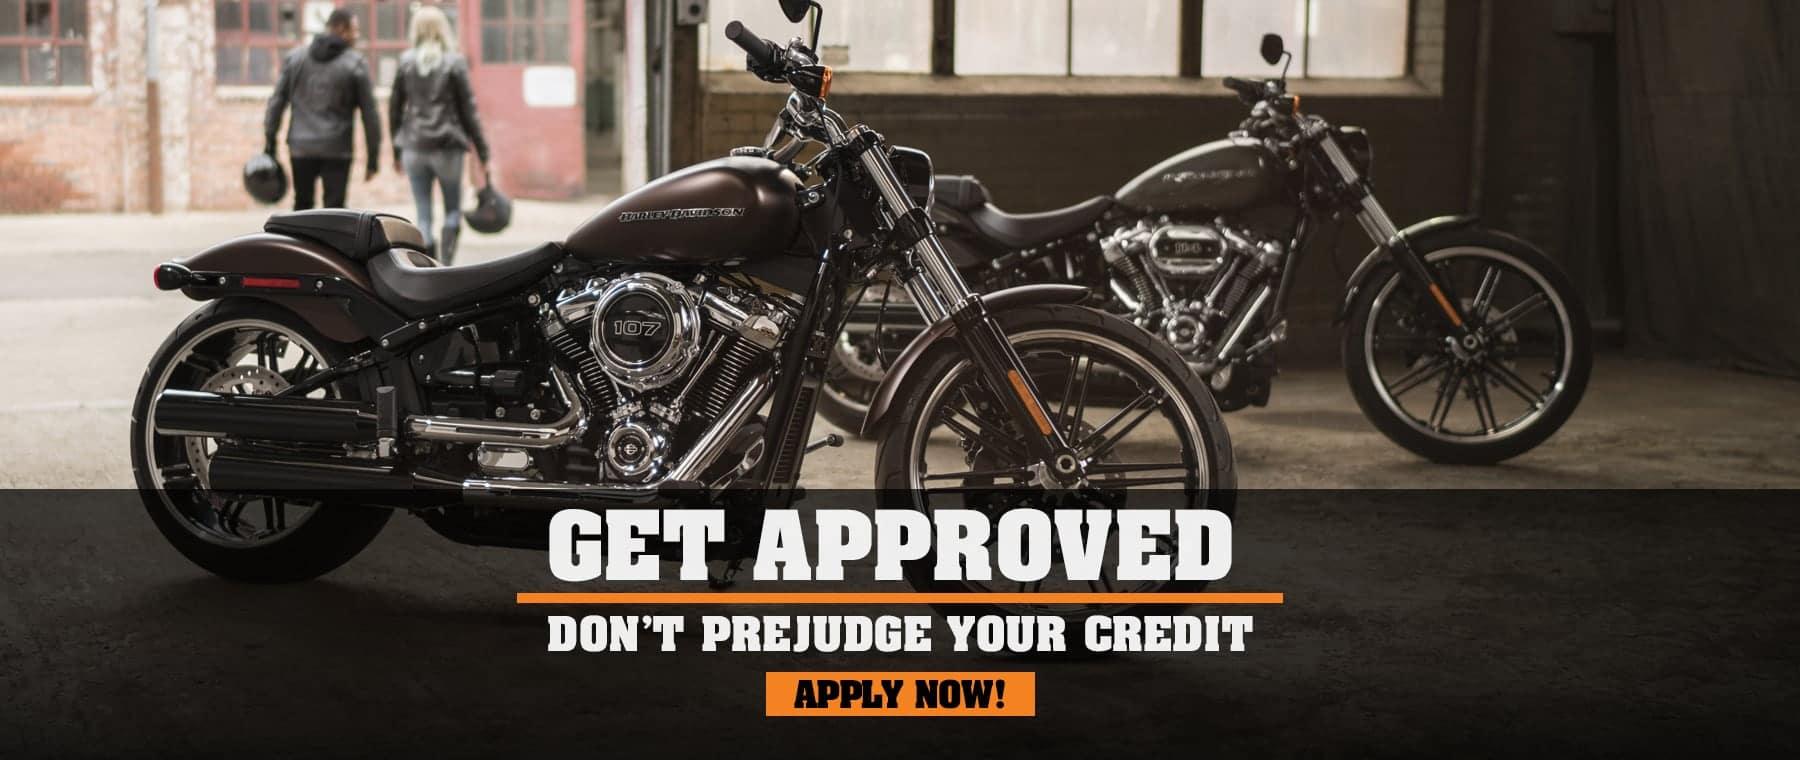 Get Approved - Don't Prejudge Your Credit